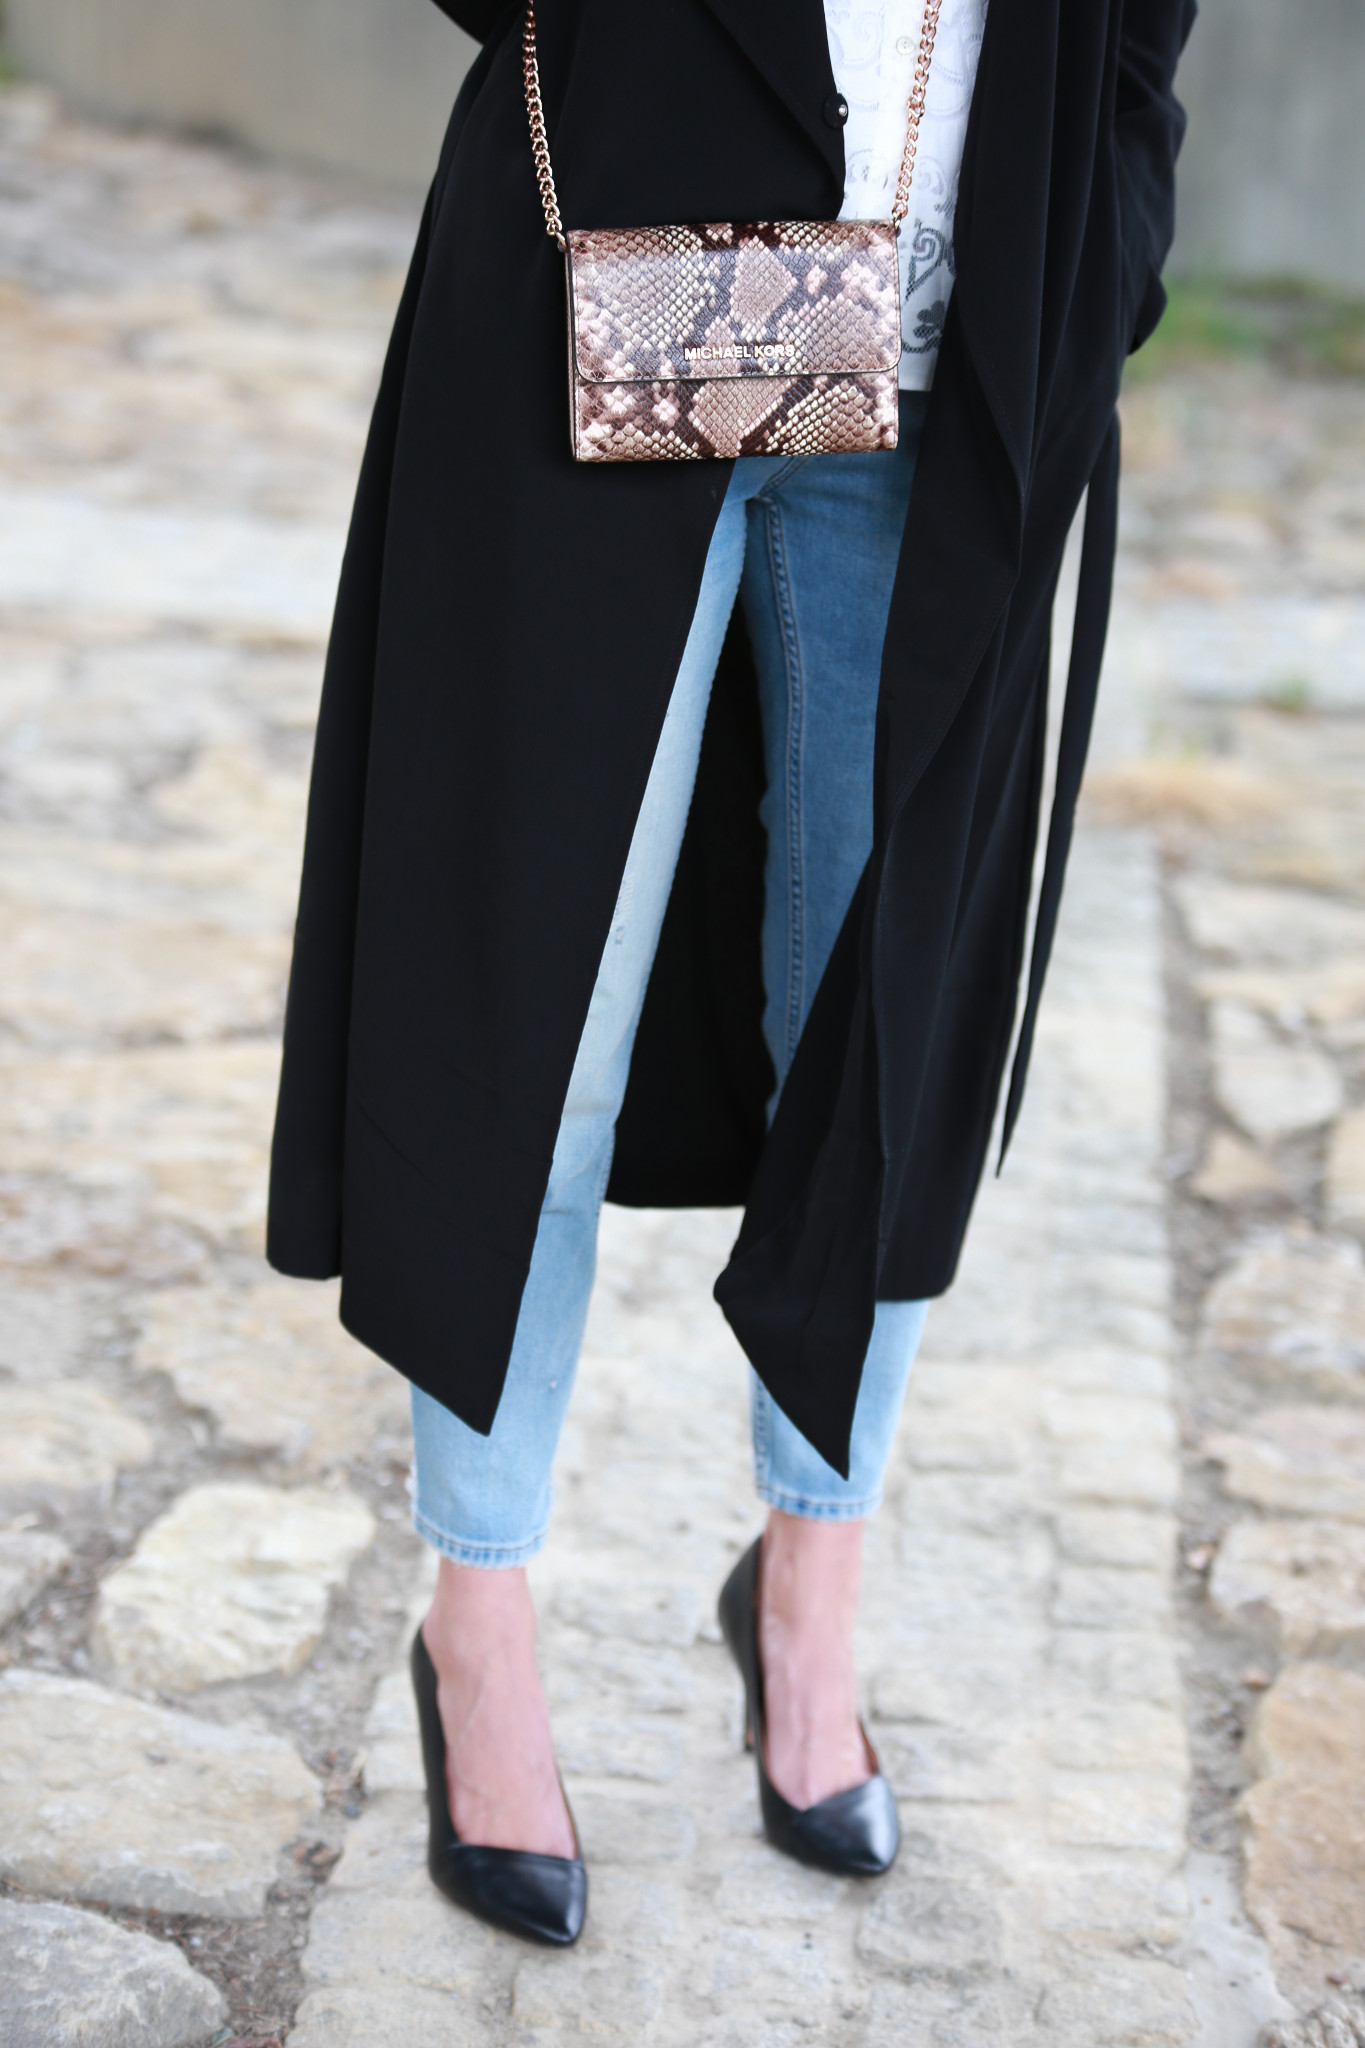 Fashion_Outfit_Michael_Kors_Jet_Set_44